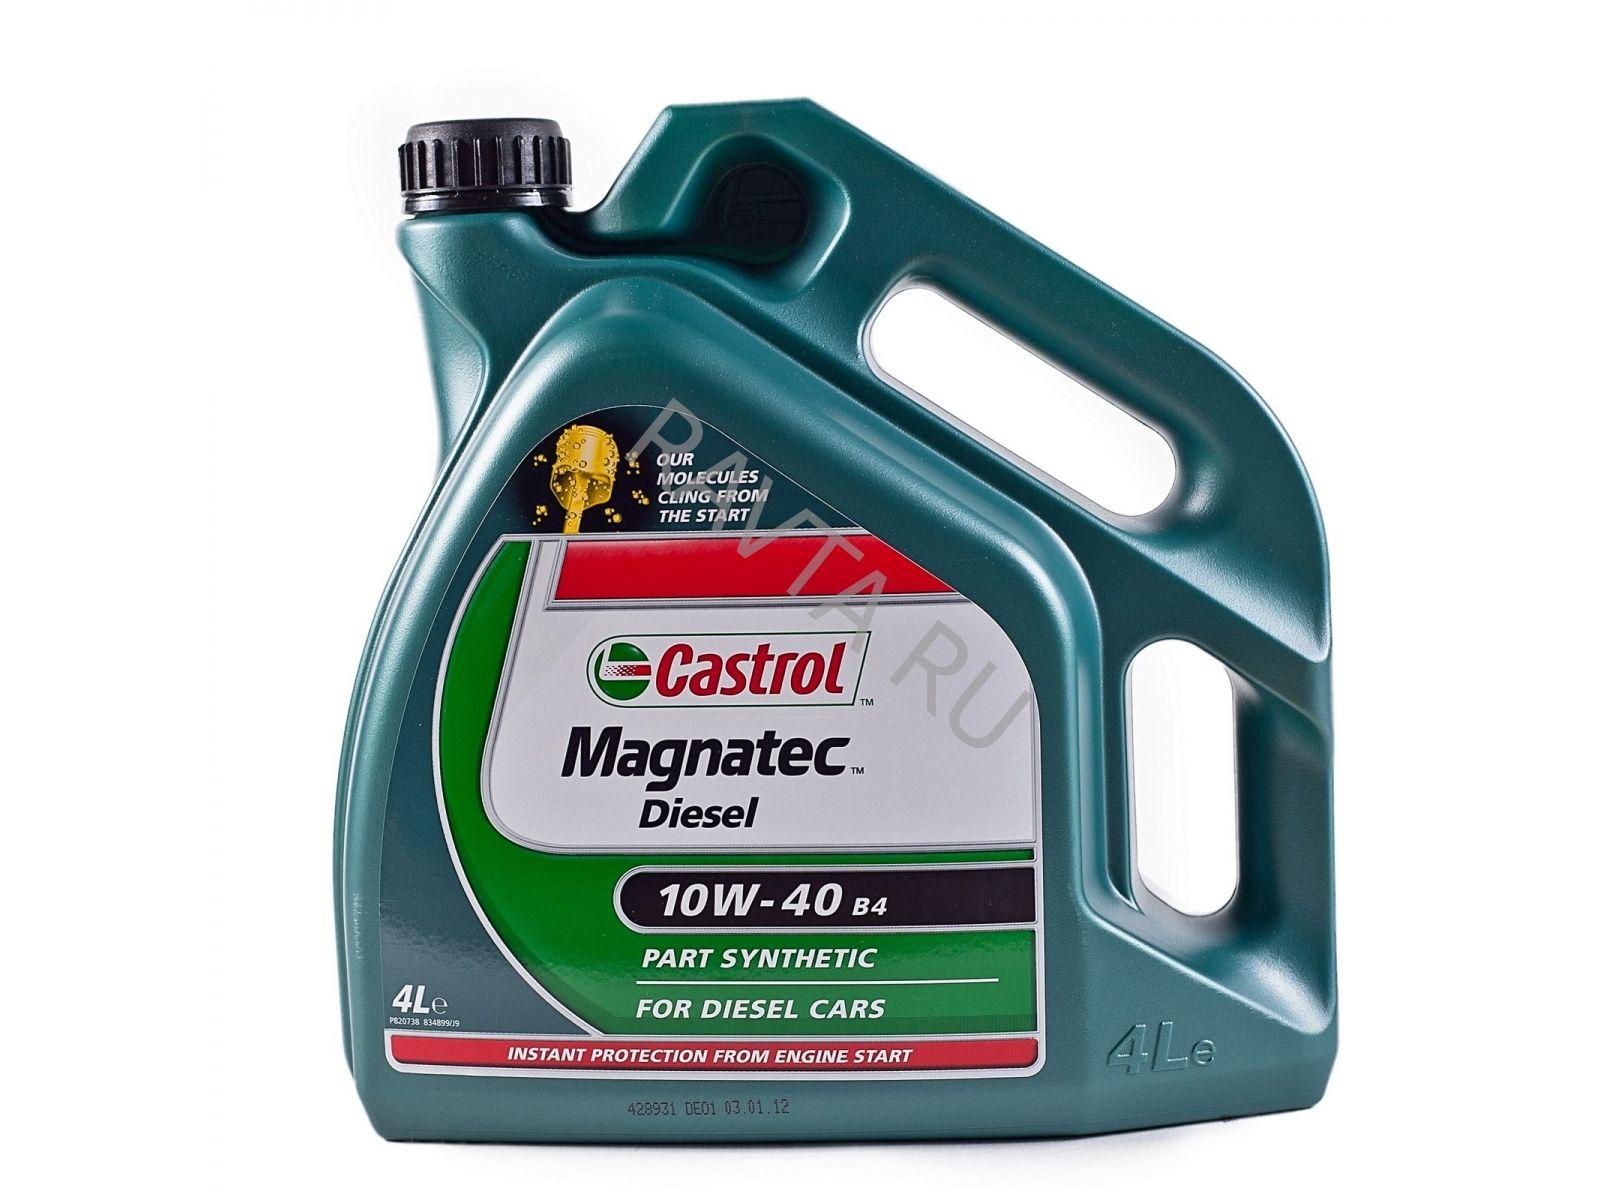 Масло Castrol Magnatec Diesel 10W 40 (4л) от Ravta